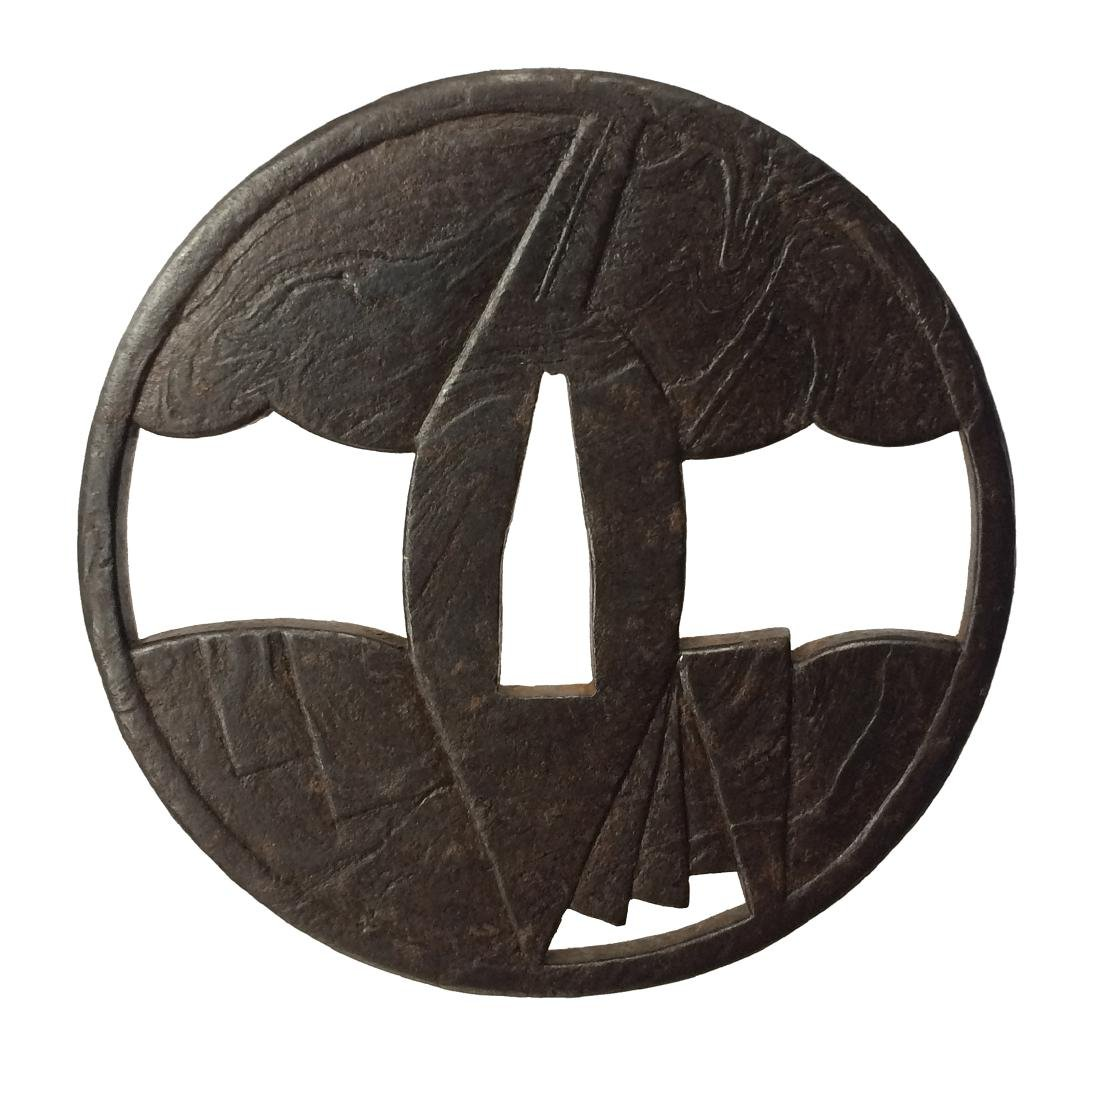 Iron tsuba with wood grain surface (mokume)byKuninaga - 4